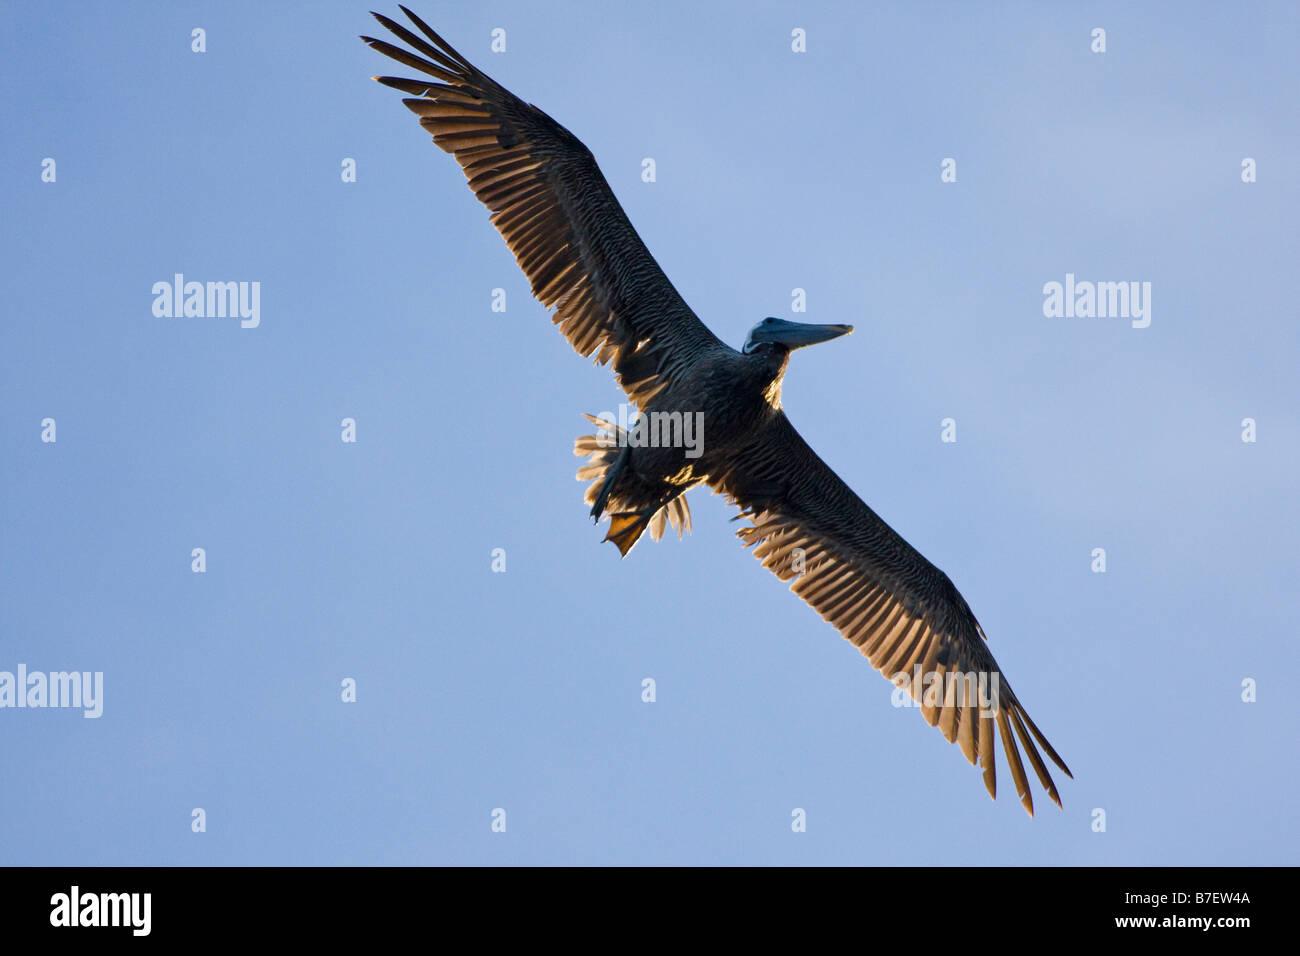 Brown Pelican (Pelecanus occidentalis) soars high in sky searching for shoal of fish - Stock Image